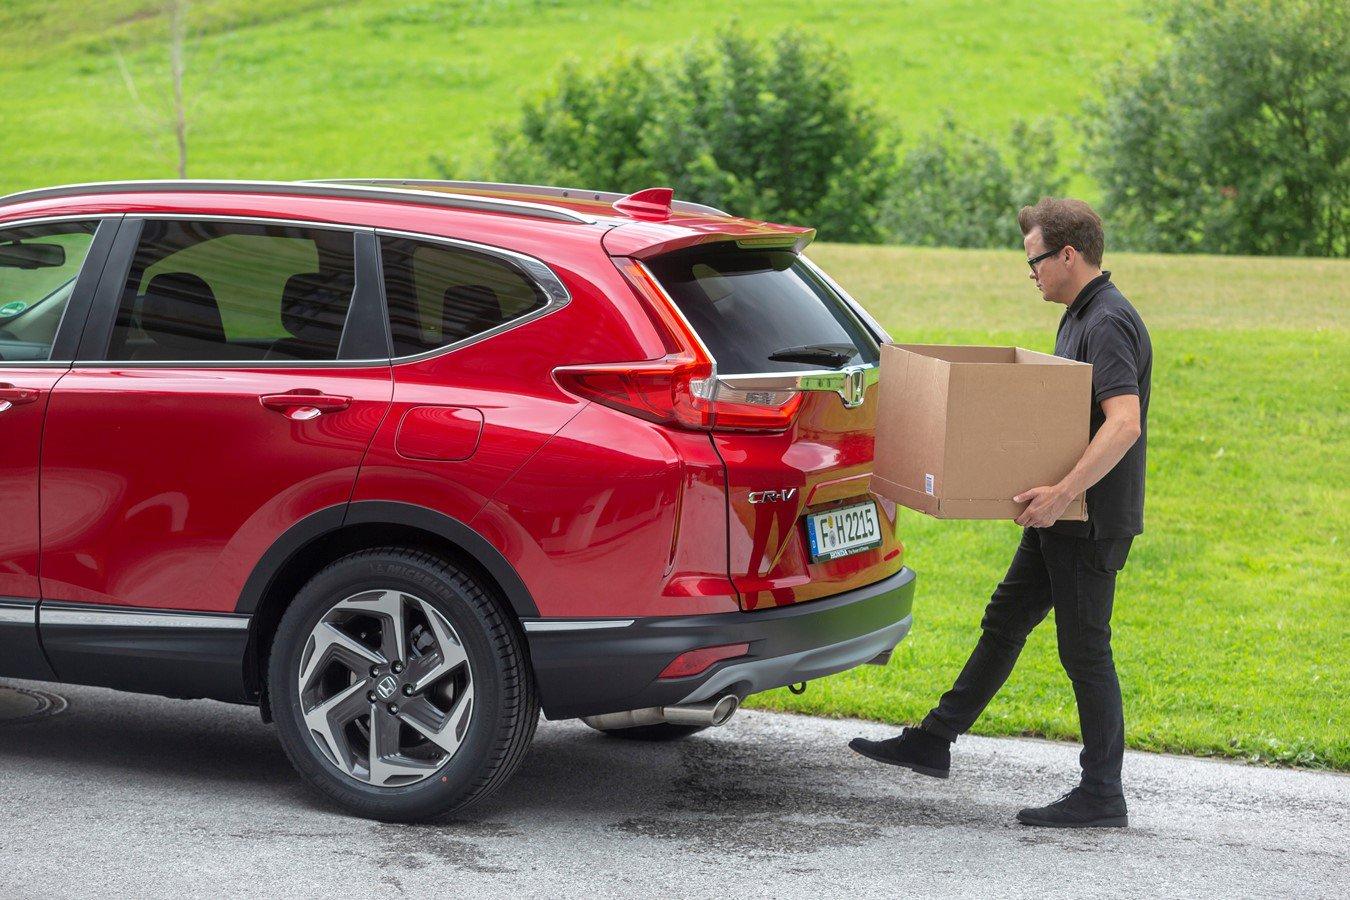 Honda CR-V and man loading box in boot